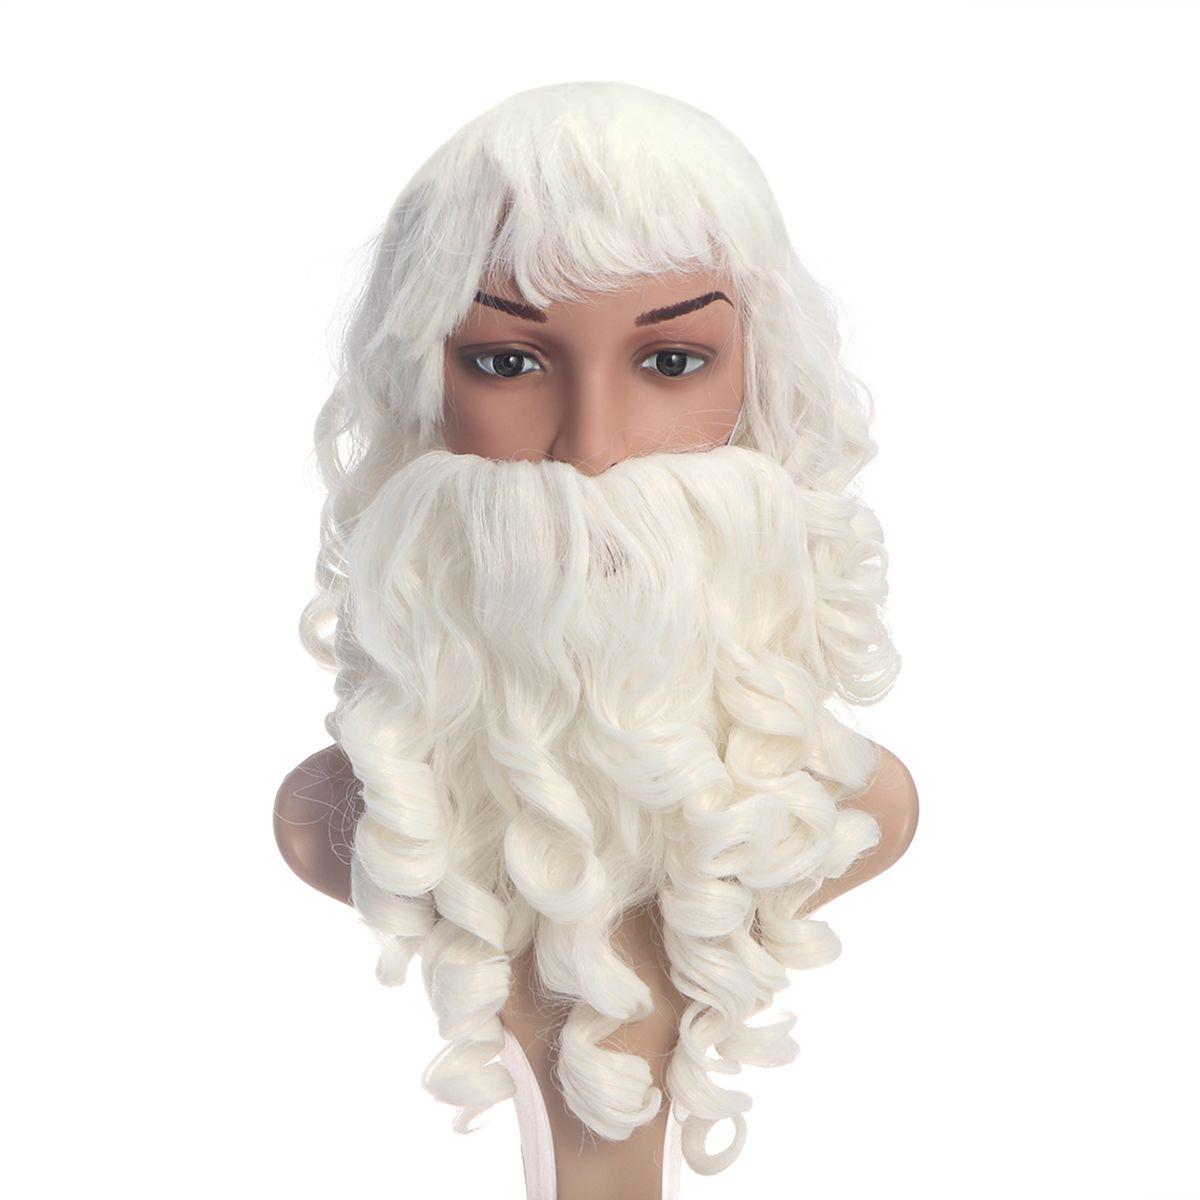 Costume Père Noël Barbe et Perruque Costume